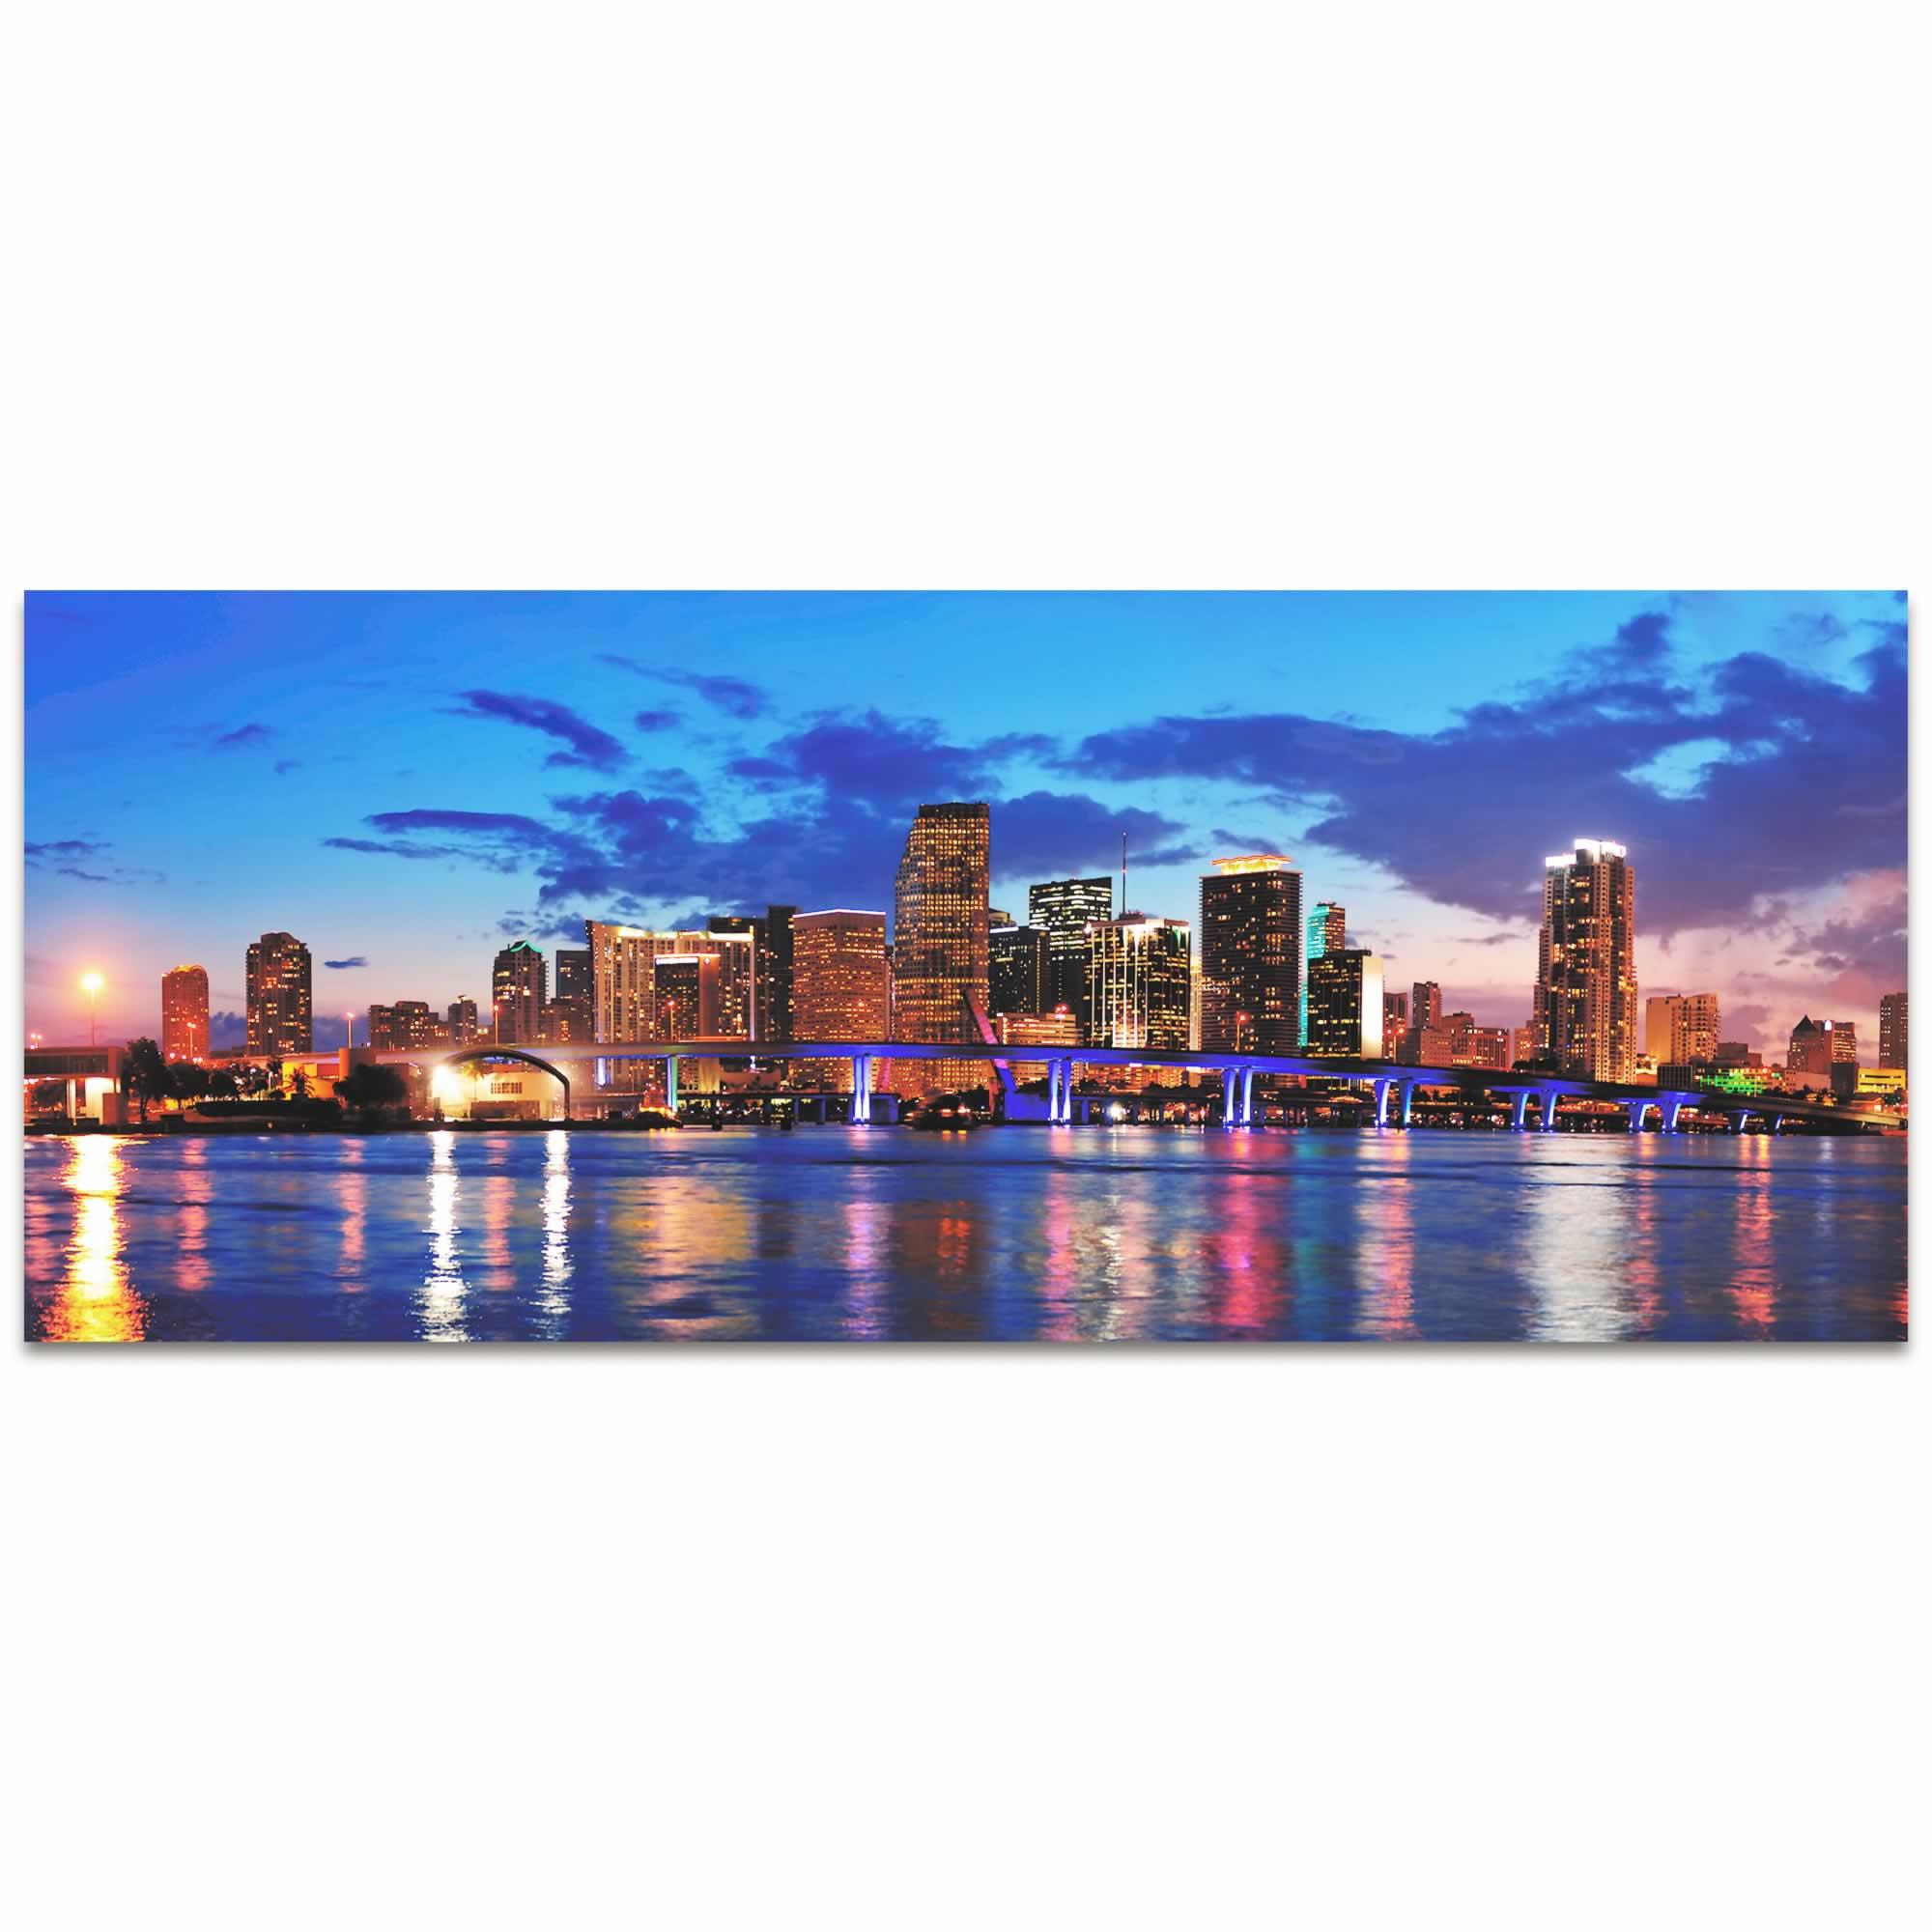 Miami City Skyline - Urban Modern Art, Designer Home Decor, Cityscape Wall Artwork, Trendy Contemporary Art - Alternate View 2